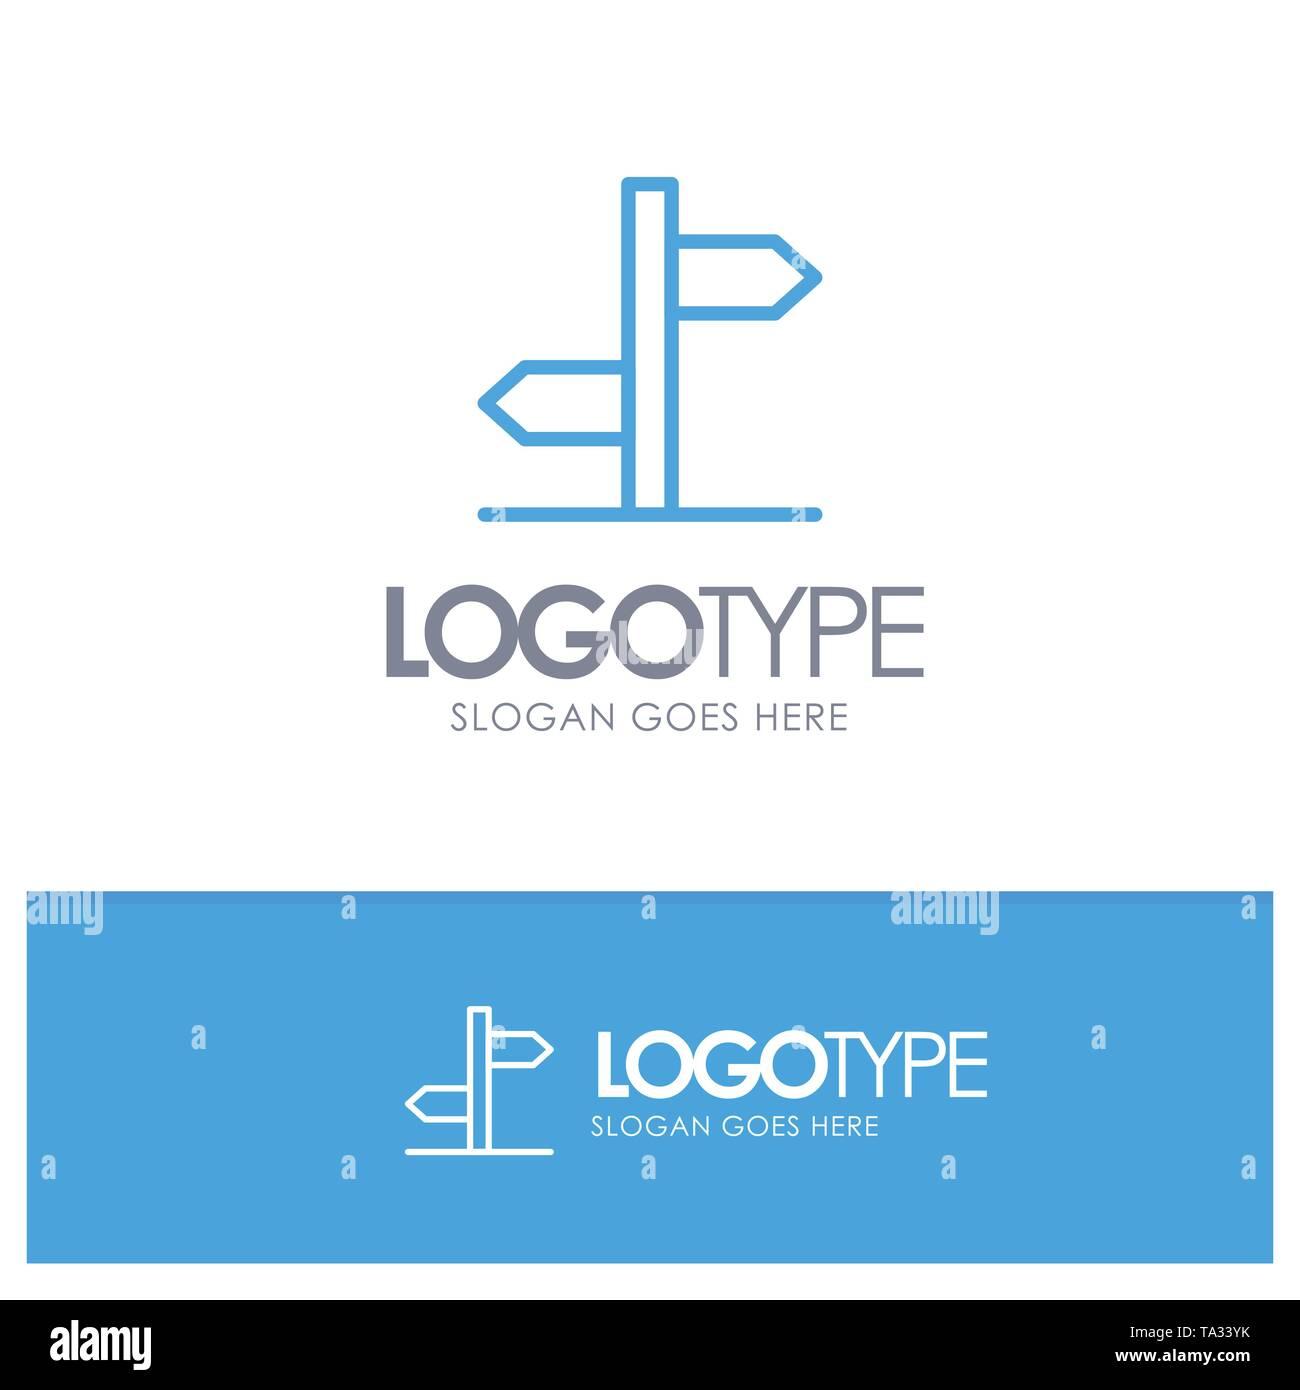 Direction, Logistic, Board, Sign Blue Outline Logo Place for Tagline - Stock Image